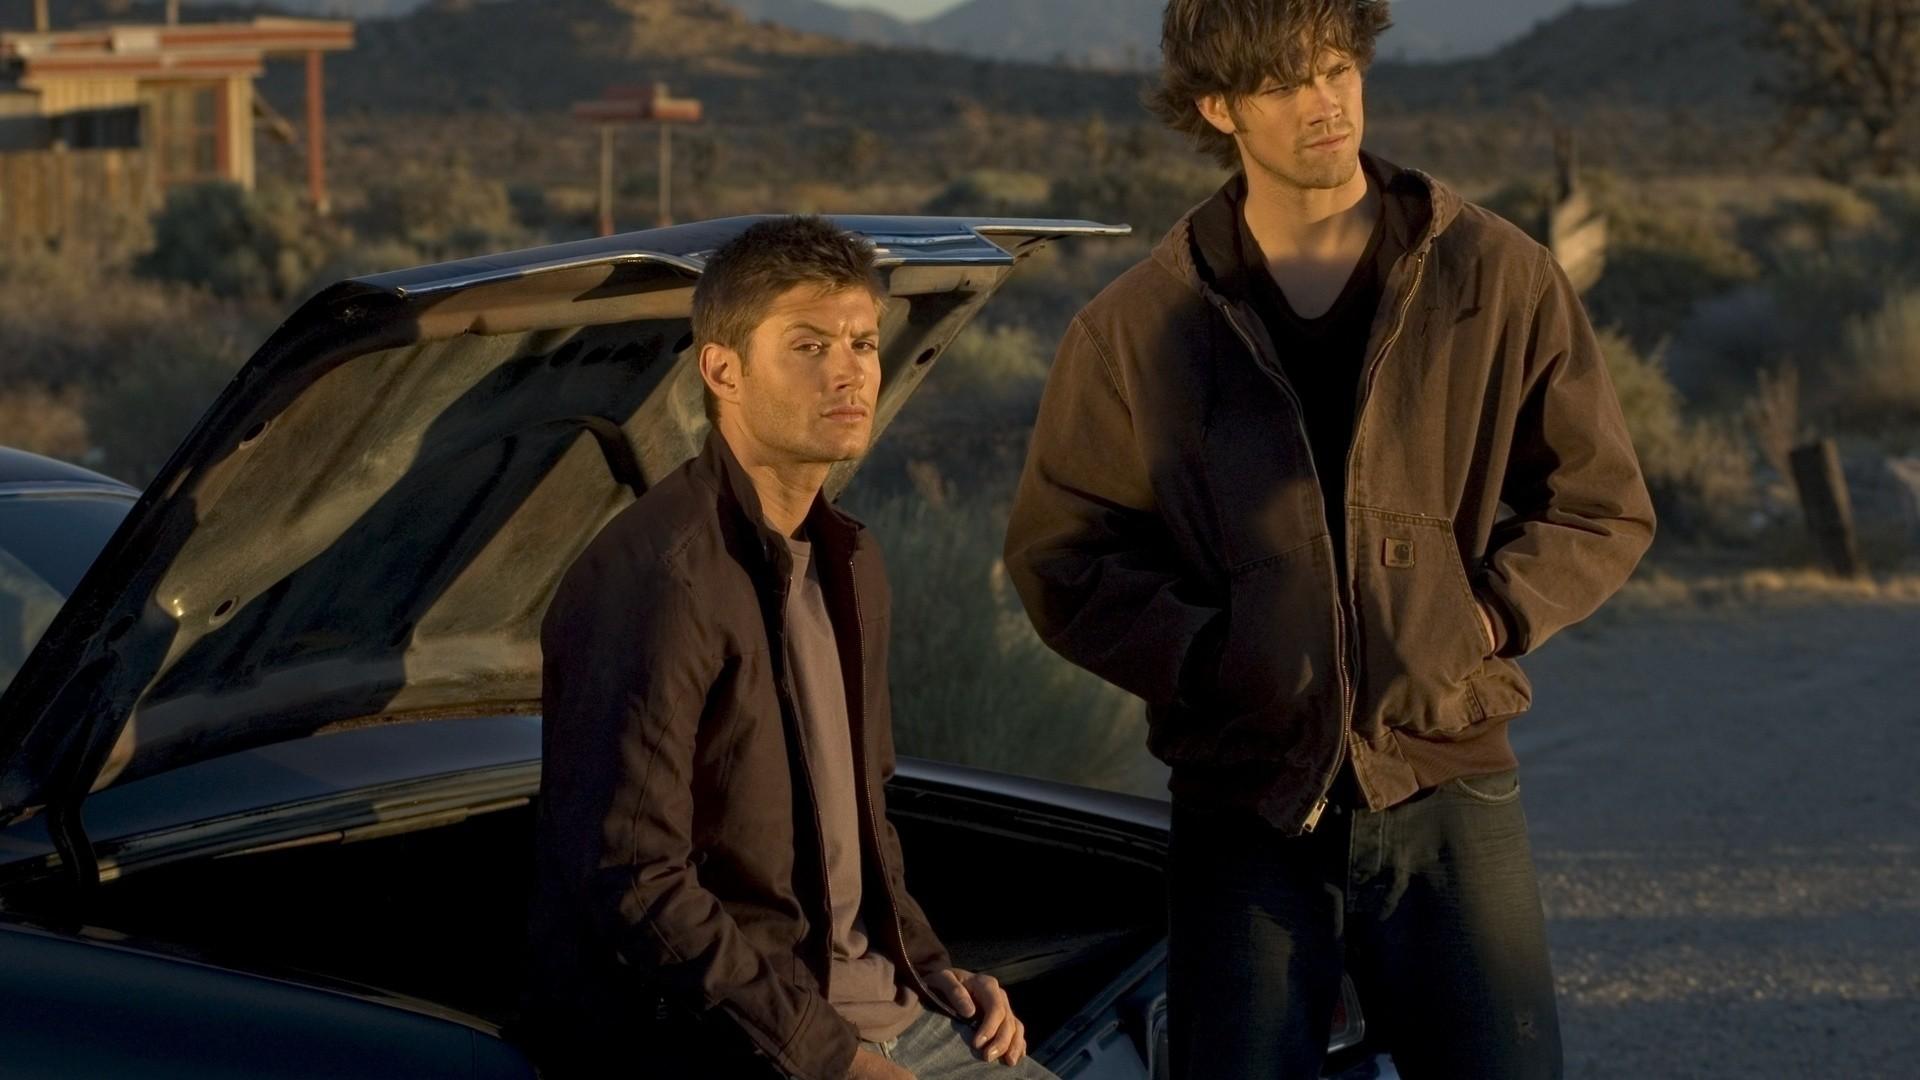 So young Dean and Sam Winchester Supernatural #spn #dean #sam #impala #